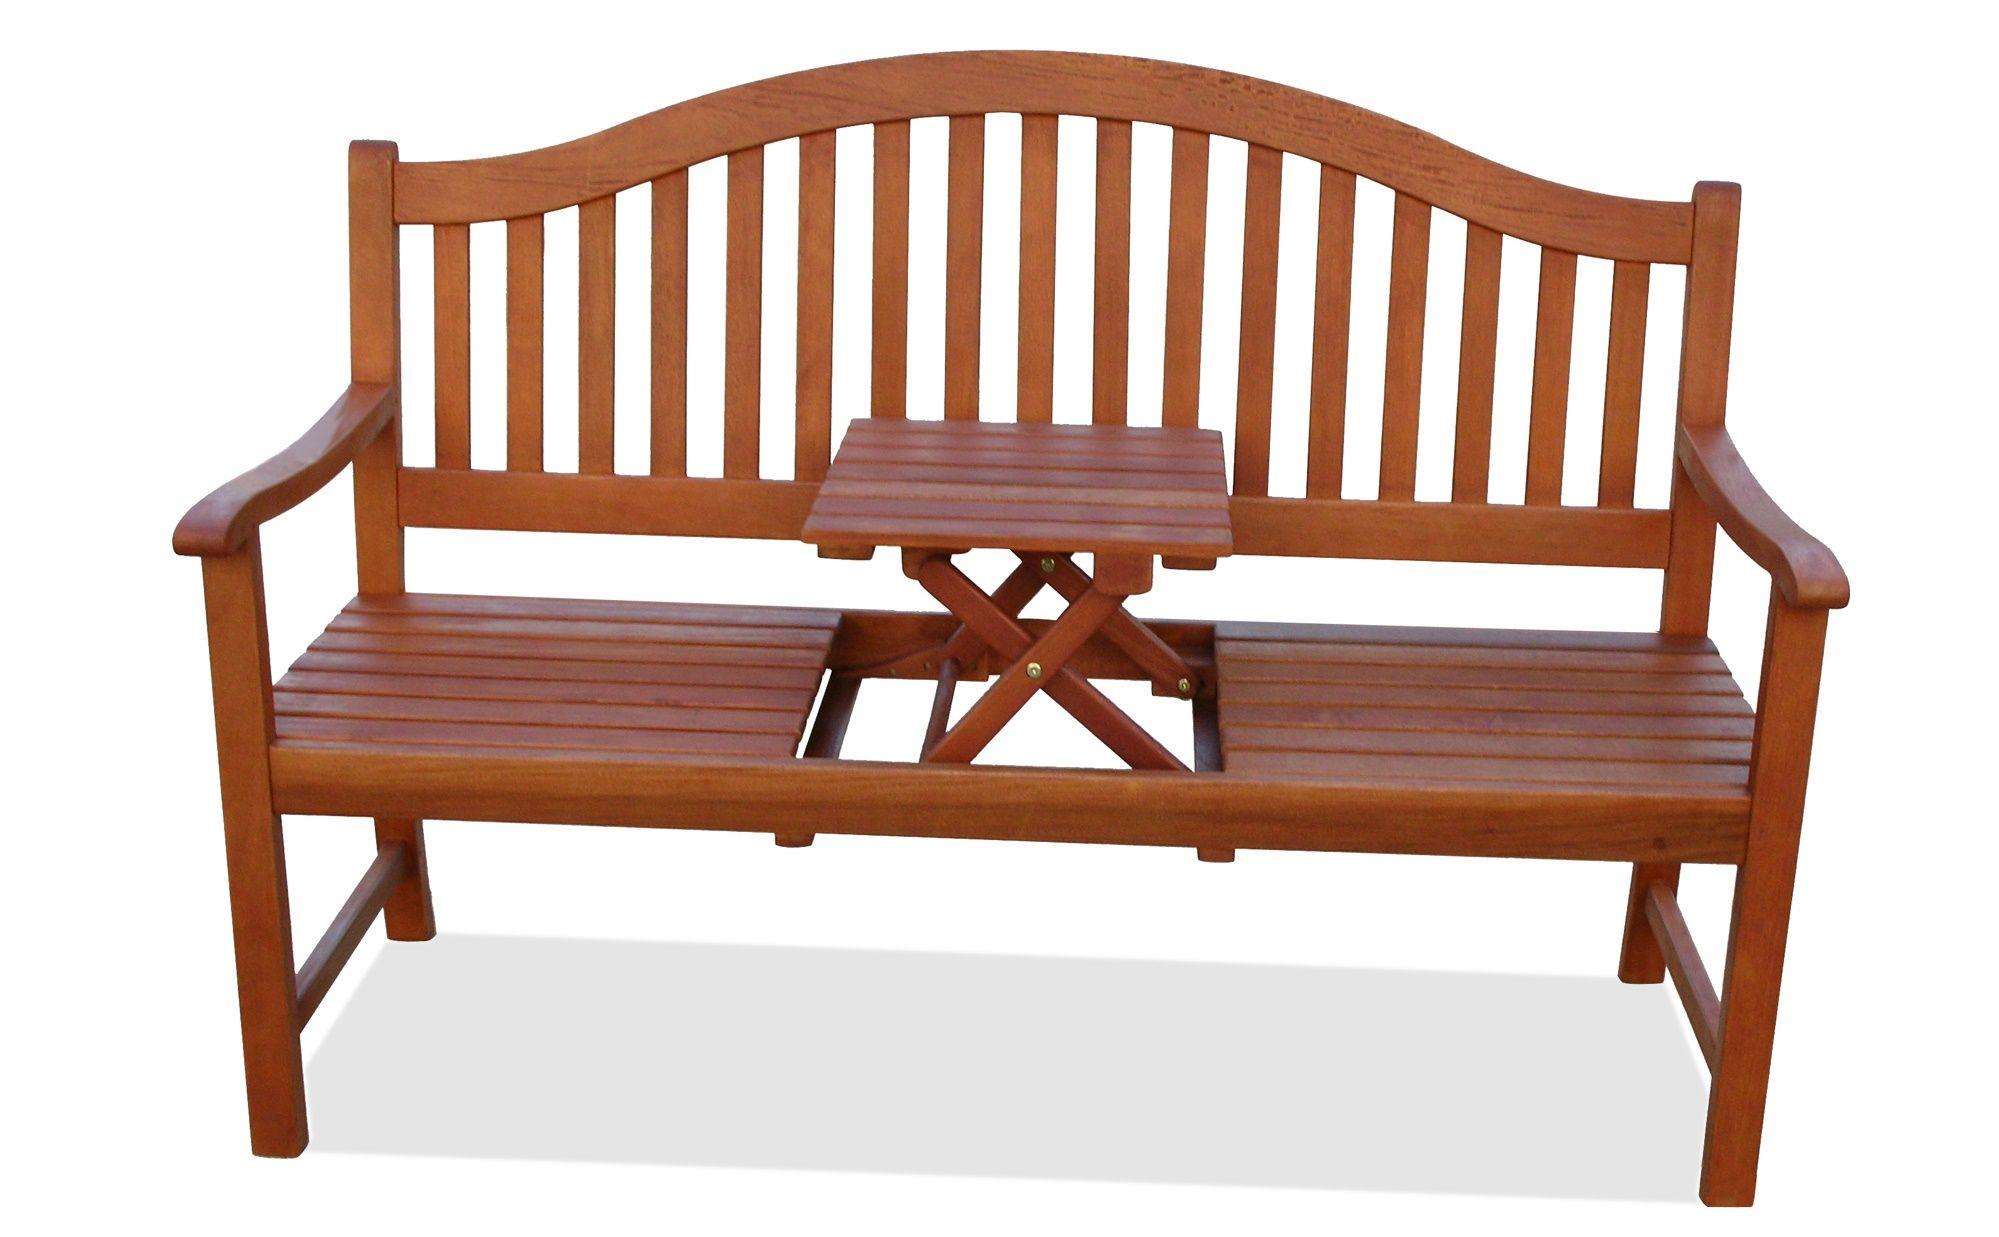 Gartenbank Eukalyptus Oder Akazie Gartenbank Holz Holzbank Mit Tisch Gartenbank